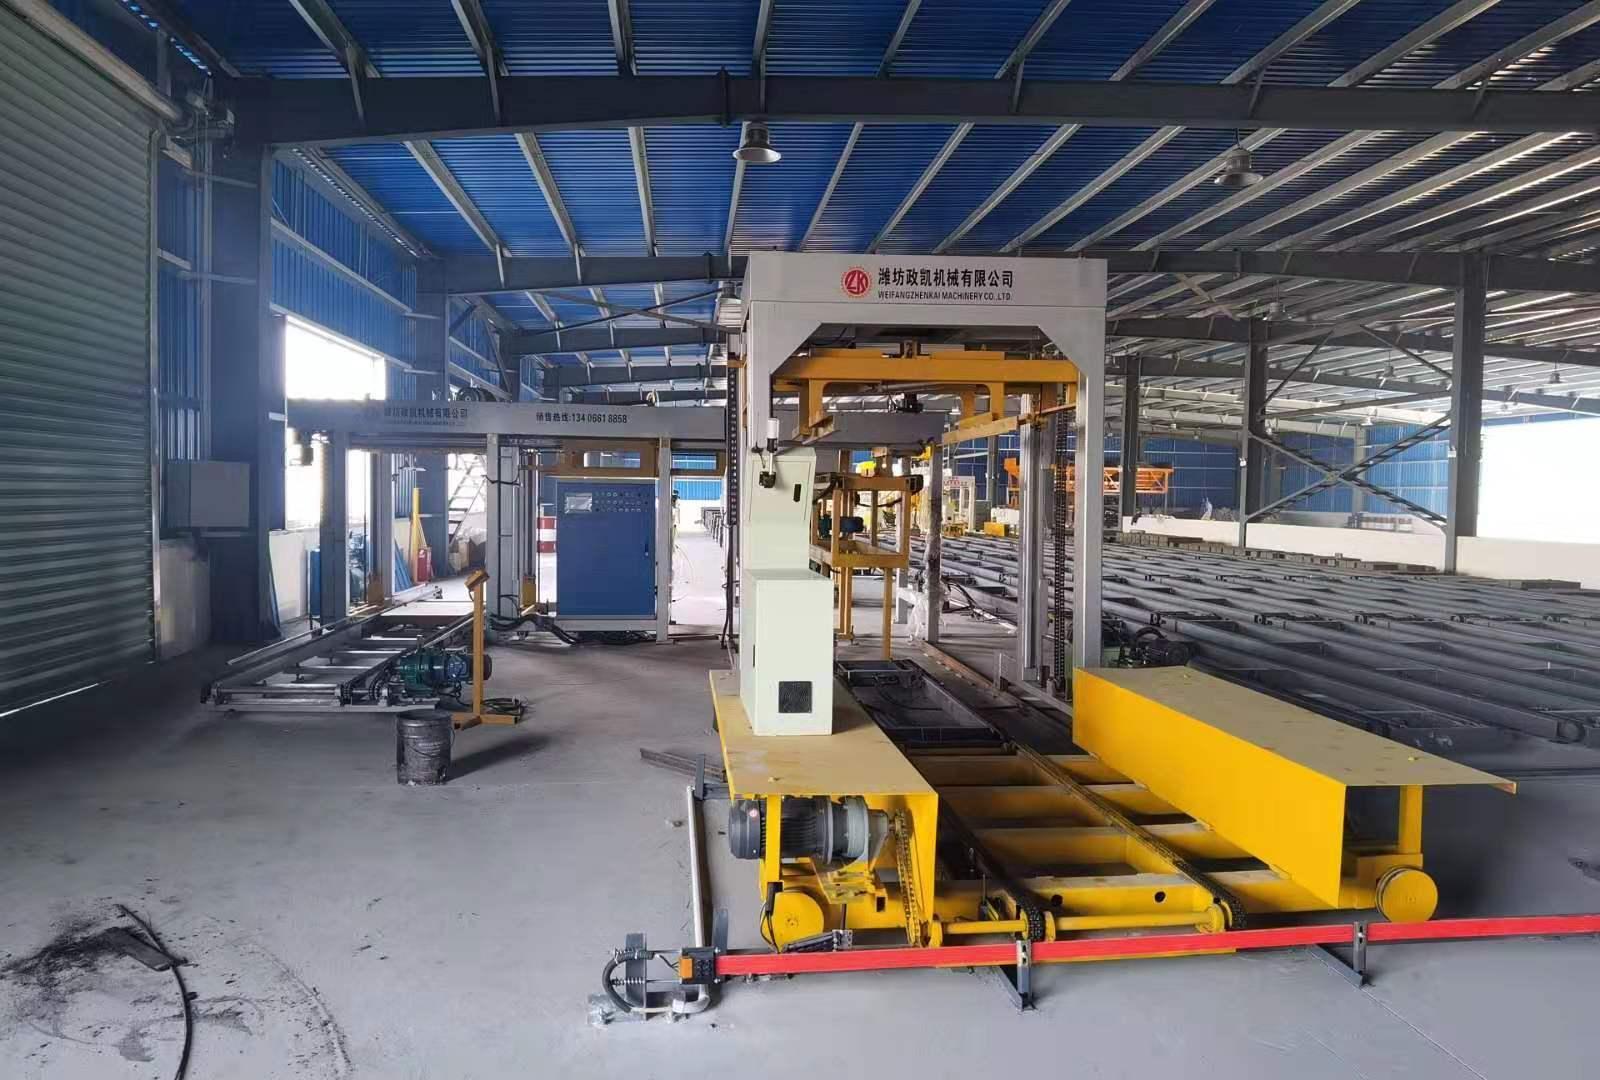 ZY500 ZY600型静压砖机 600吨静压砖机 需要投资多少